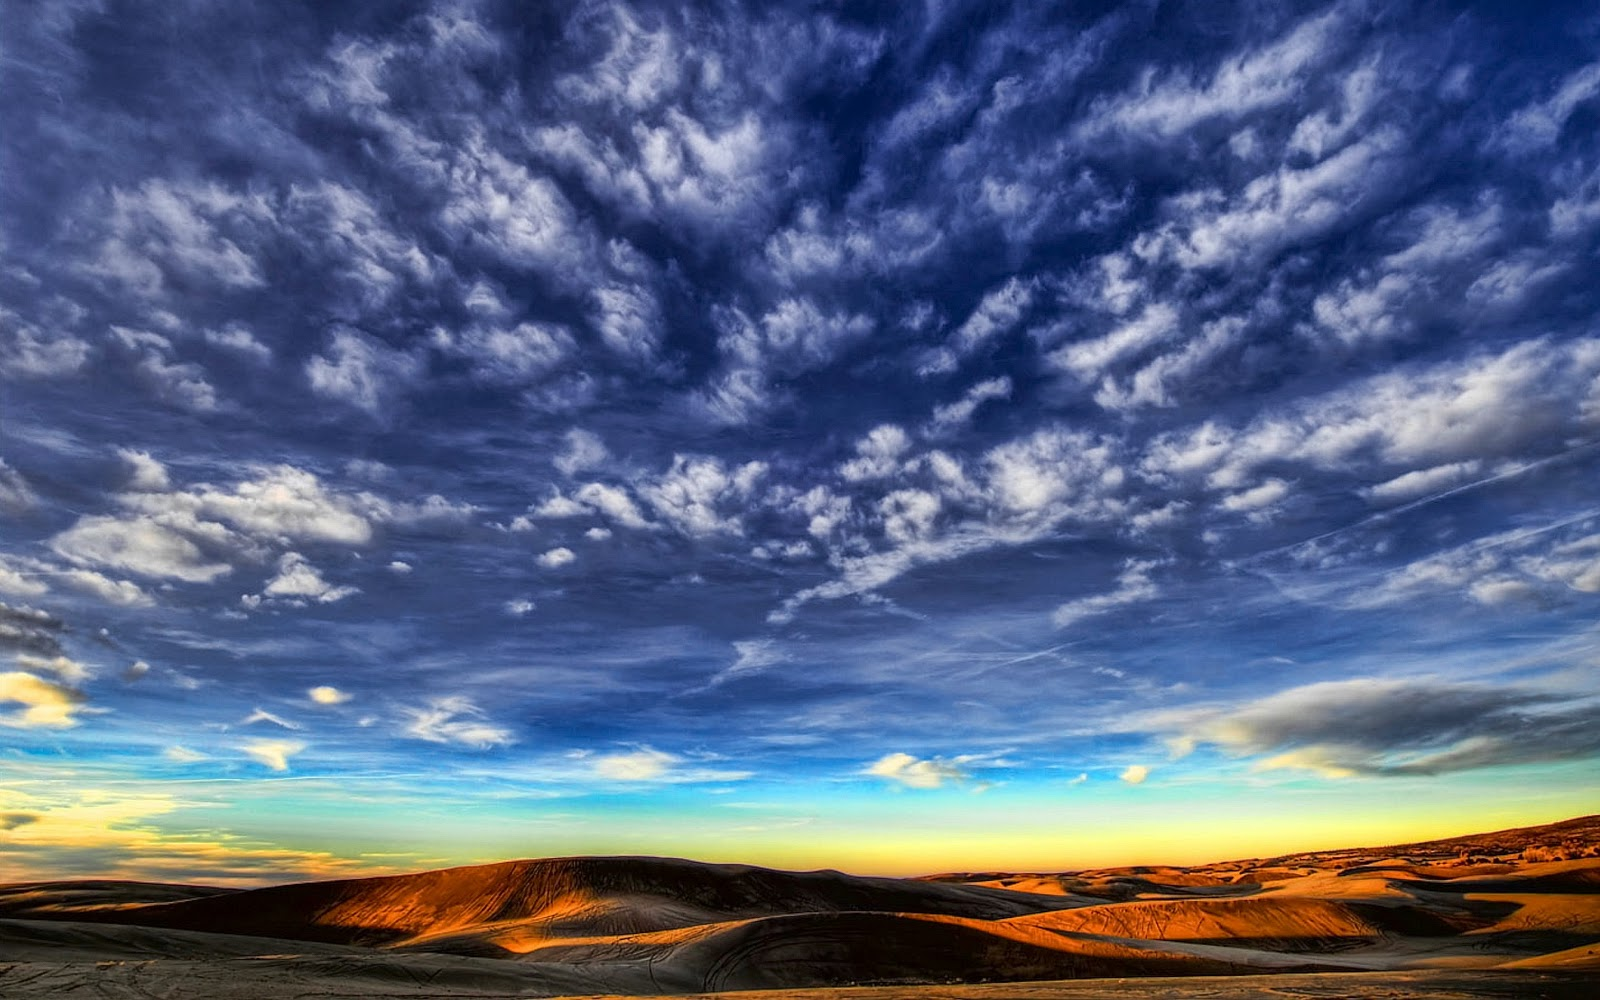 Wide Blue Sky Scenery Backgrounds